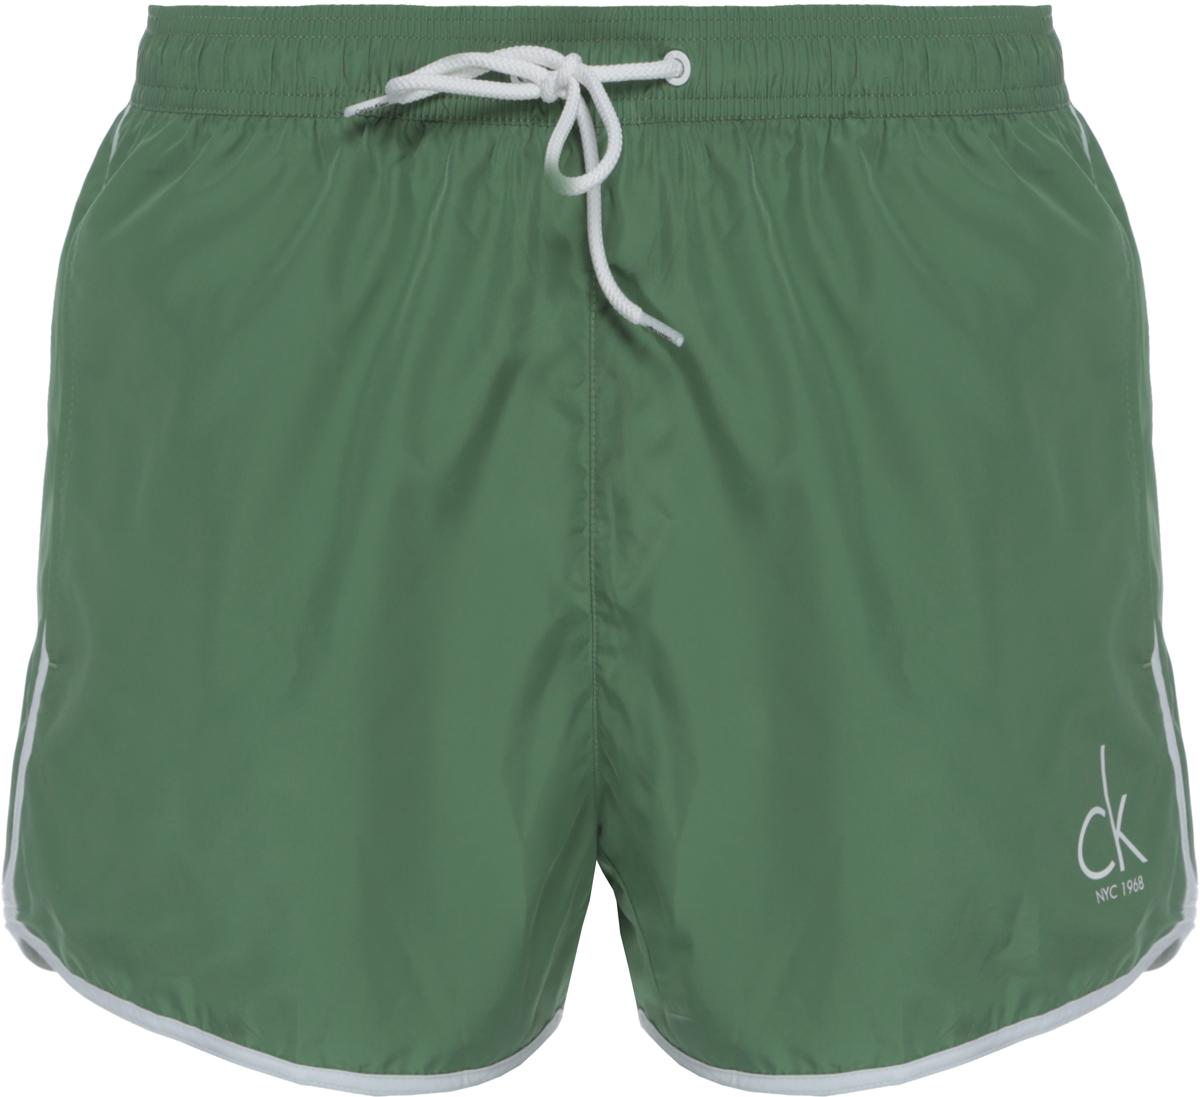 Шорты купальные мужские Calvin Klein Underwear, цвет: зеленый. KM0KM00136_309. Размер L (50)KM0KM00136_309